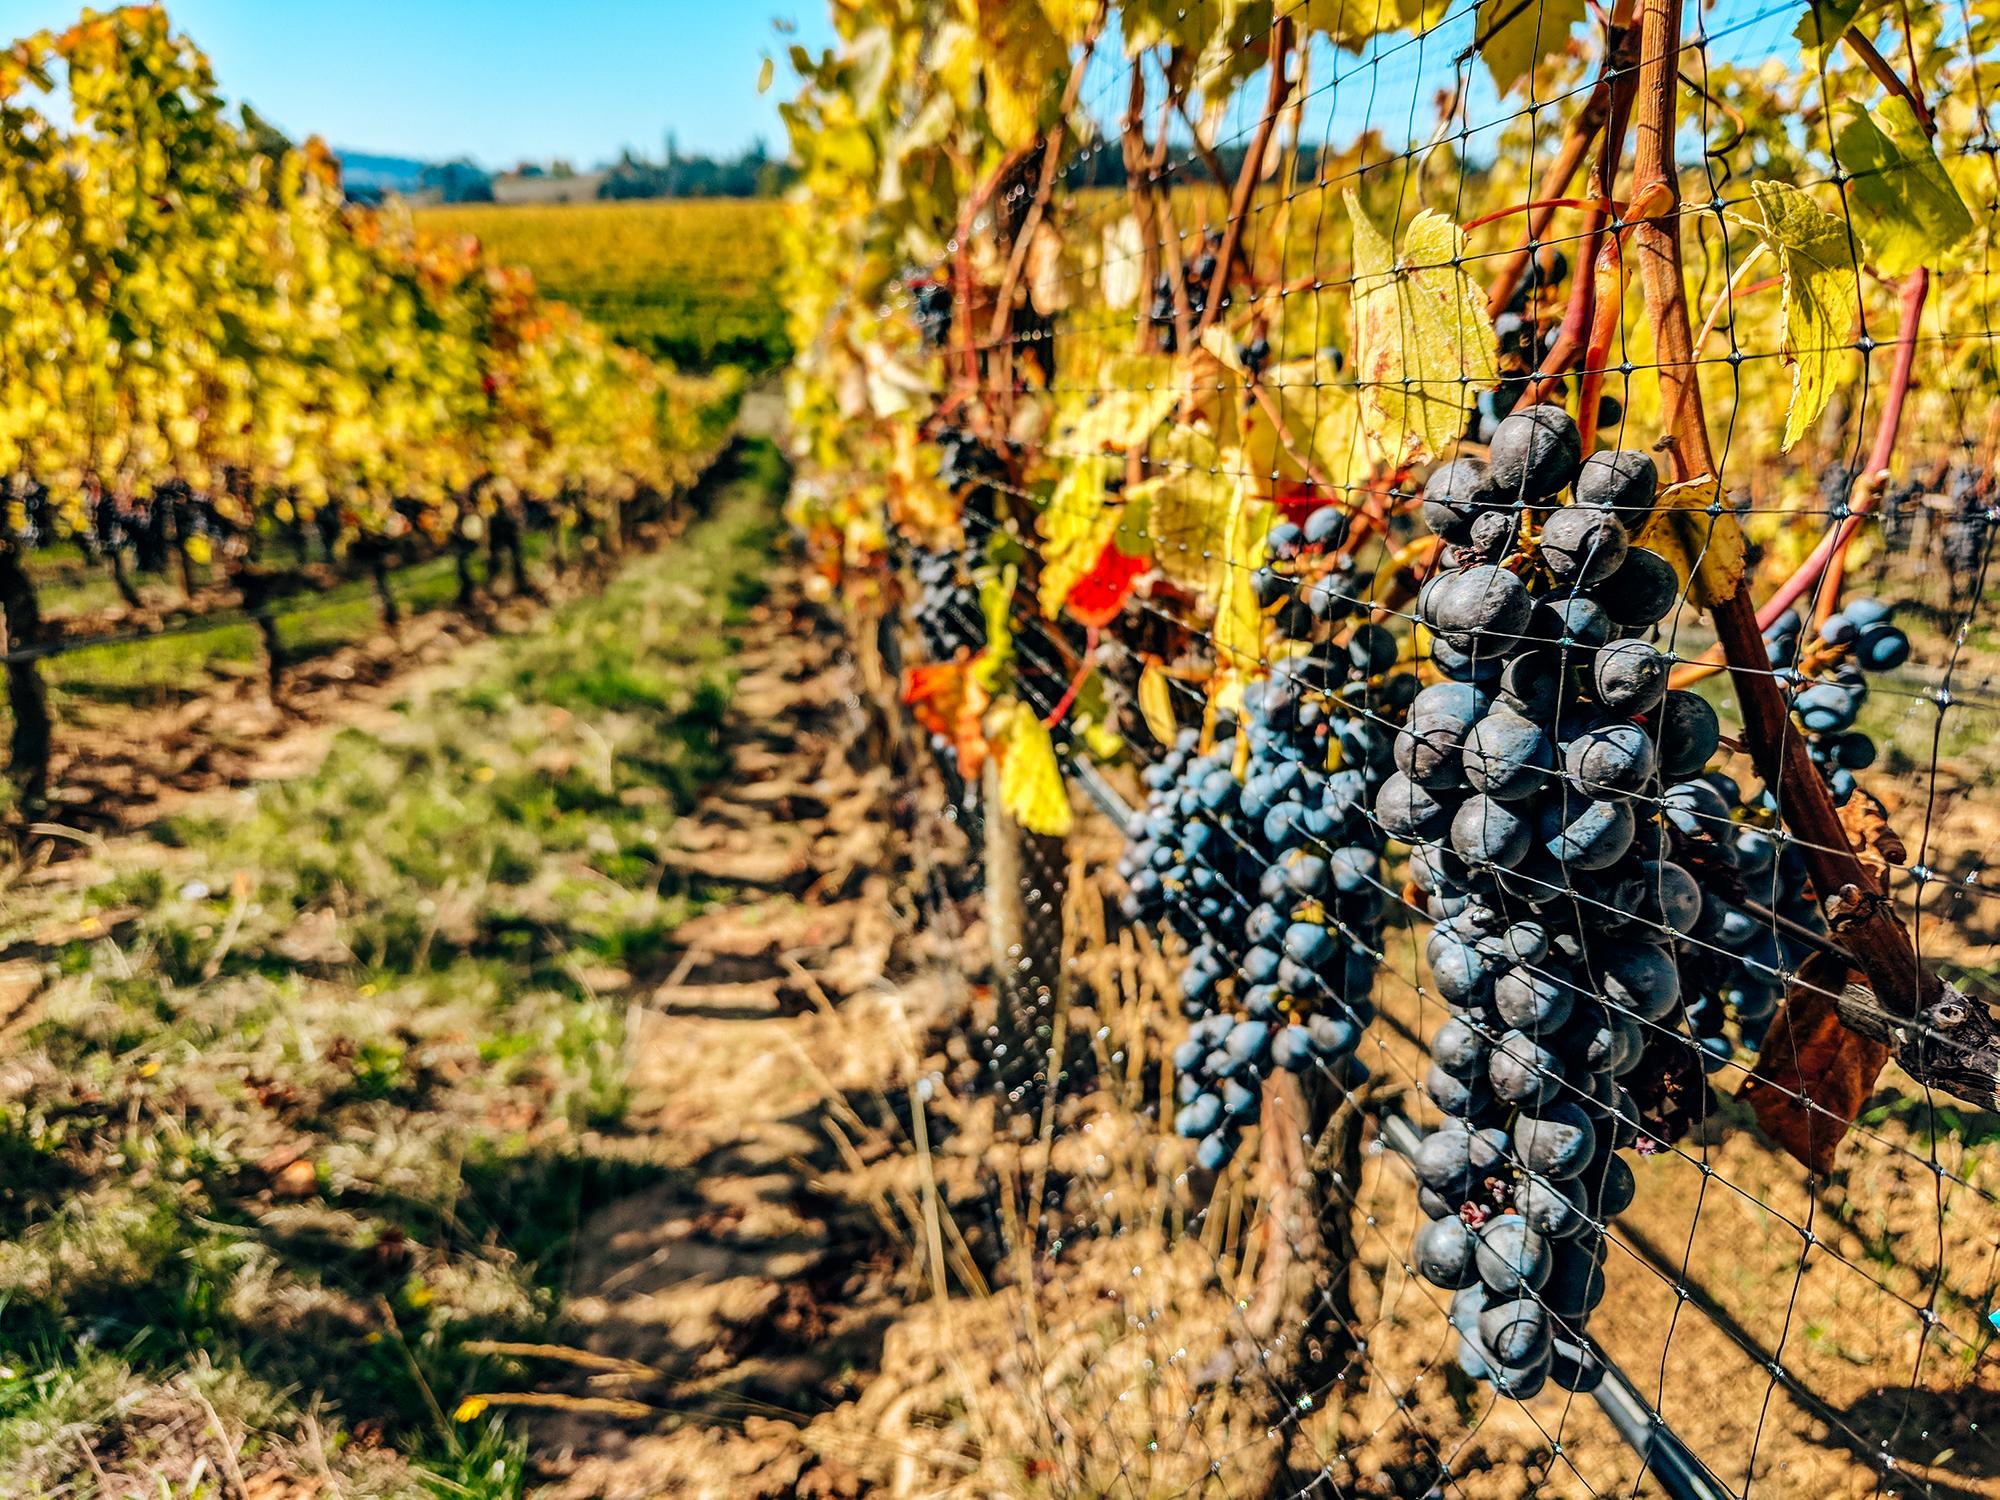 Adelsheim Vineyard vine grapes